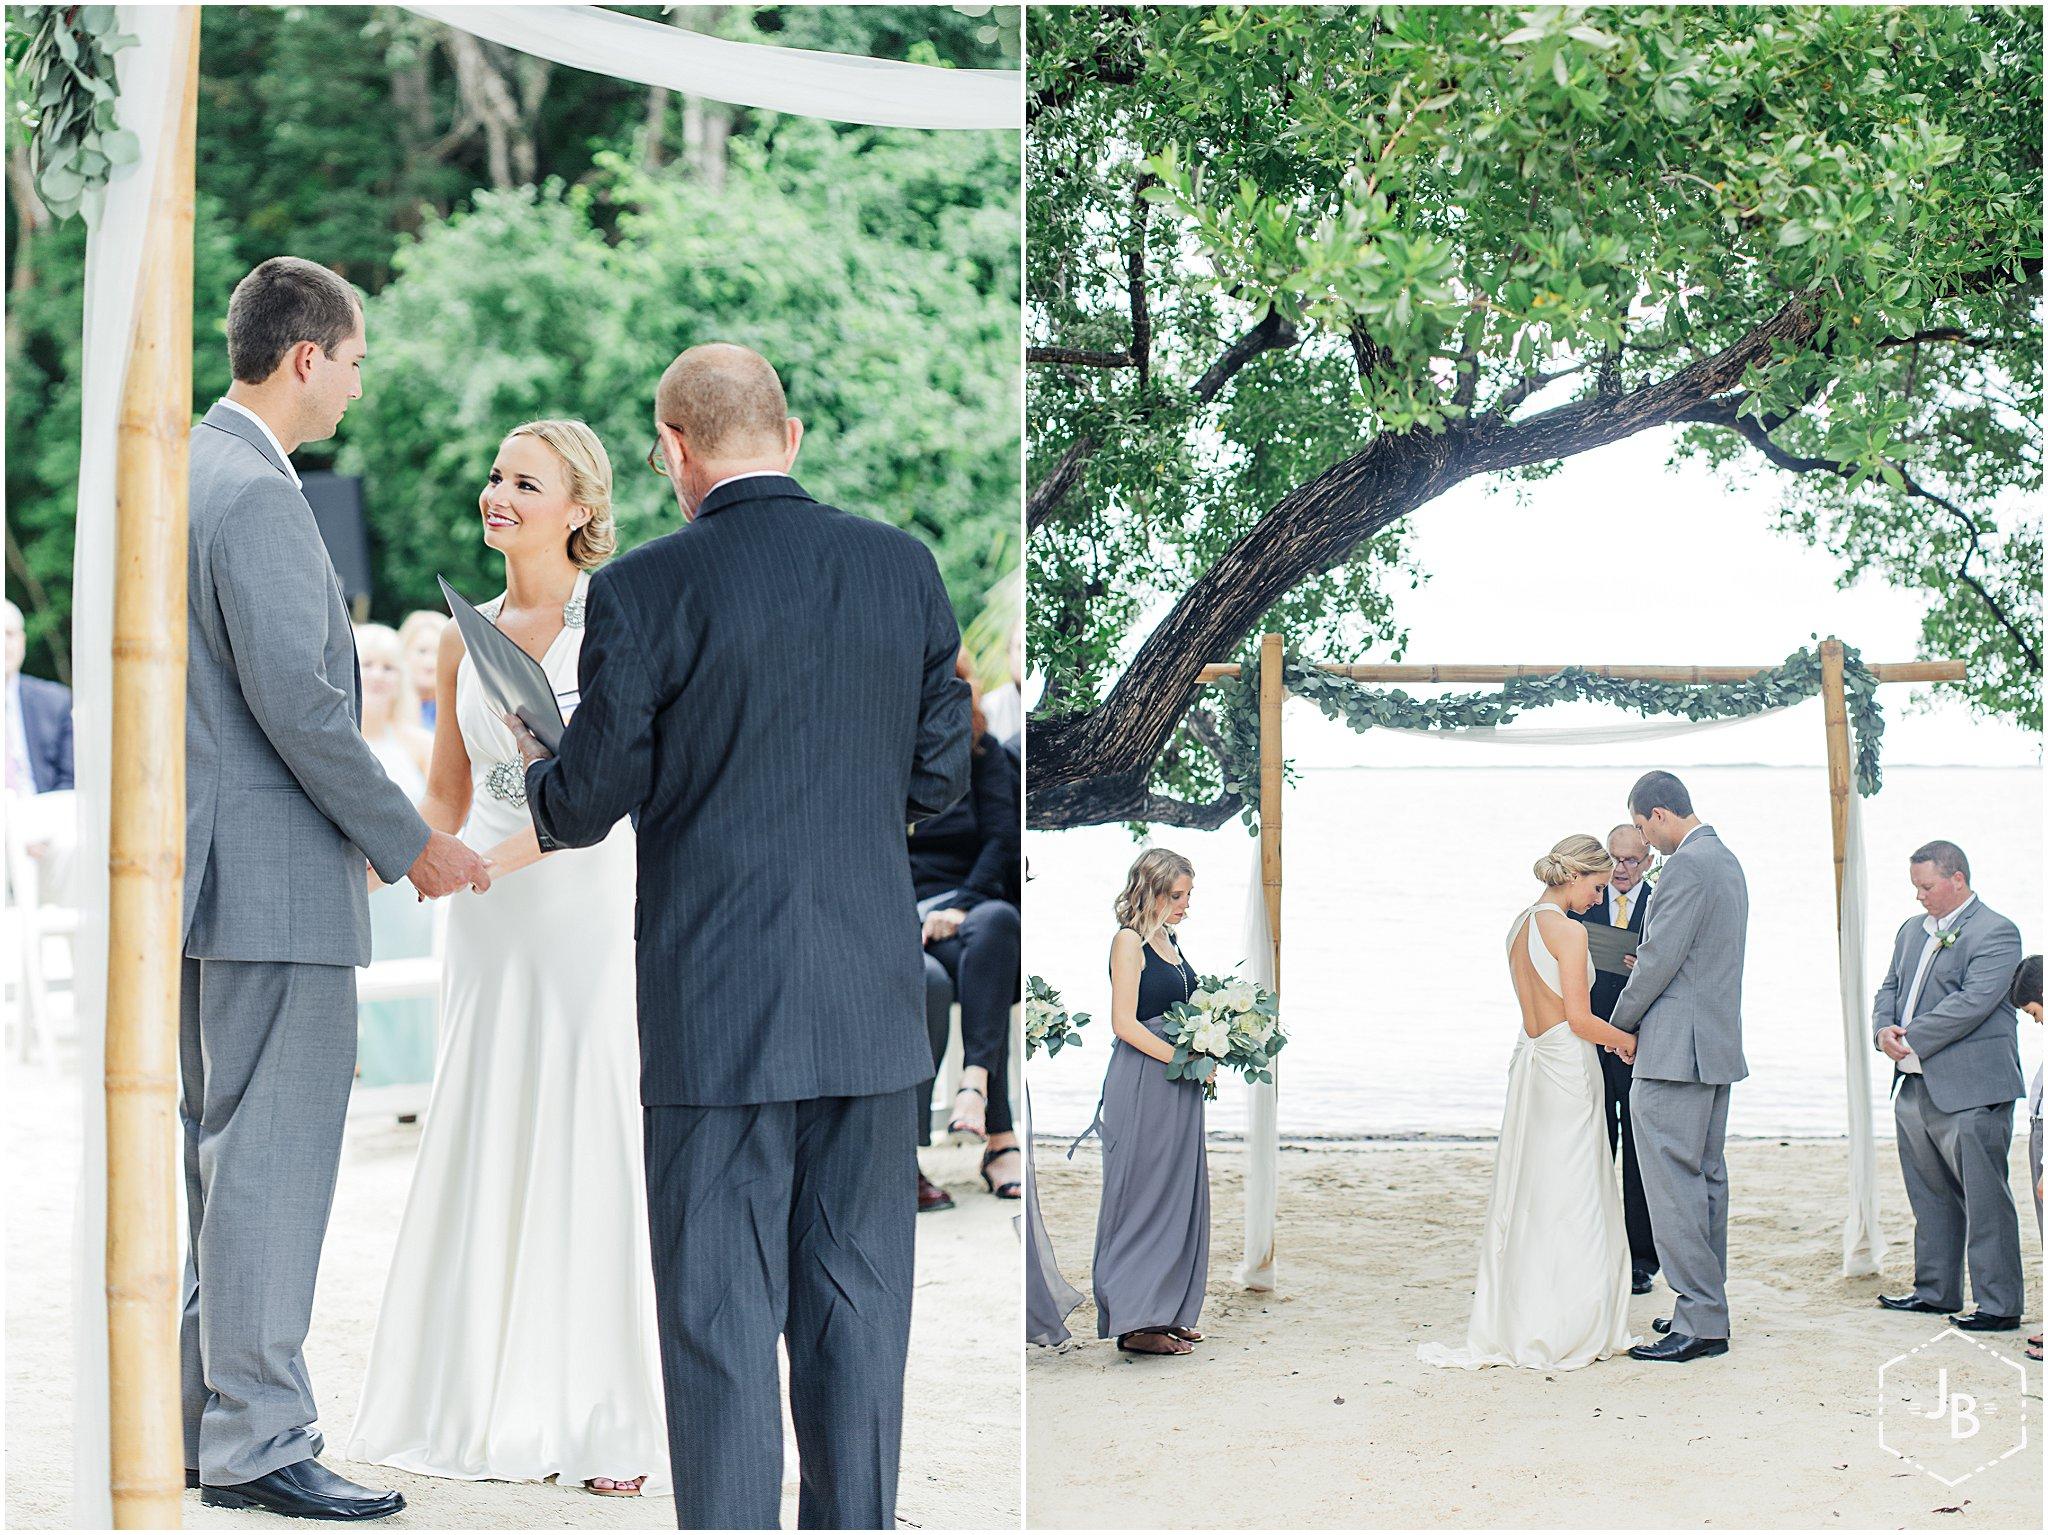 WeddingandEngagementFloridaPhotographer_1129.jpg